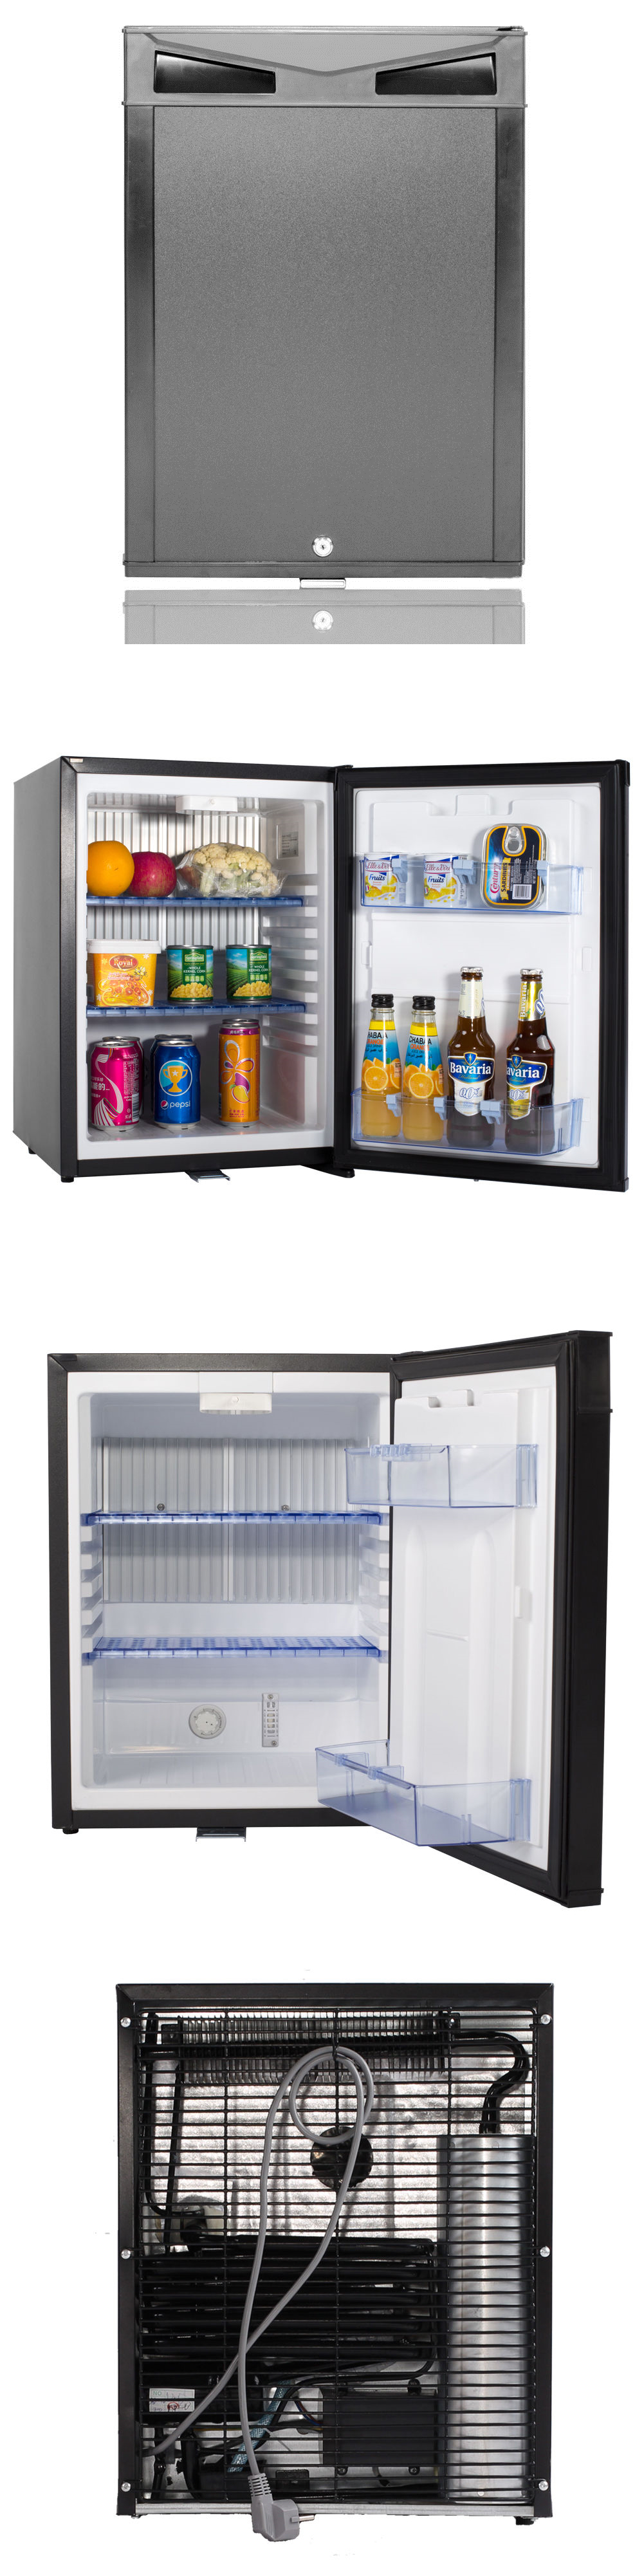 mini fridges 71262 40l 12v 110v mini refrigerator with lock hotel